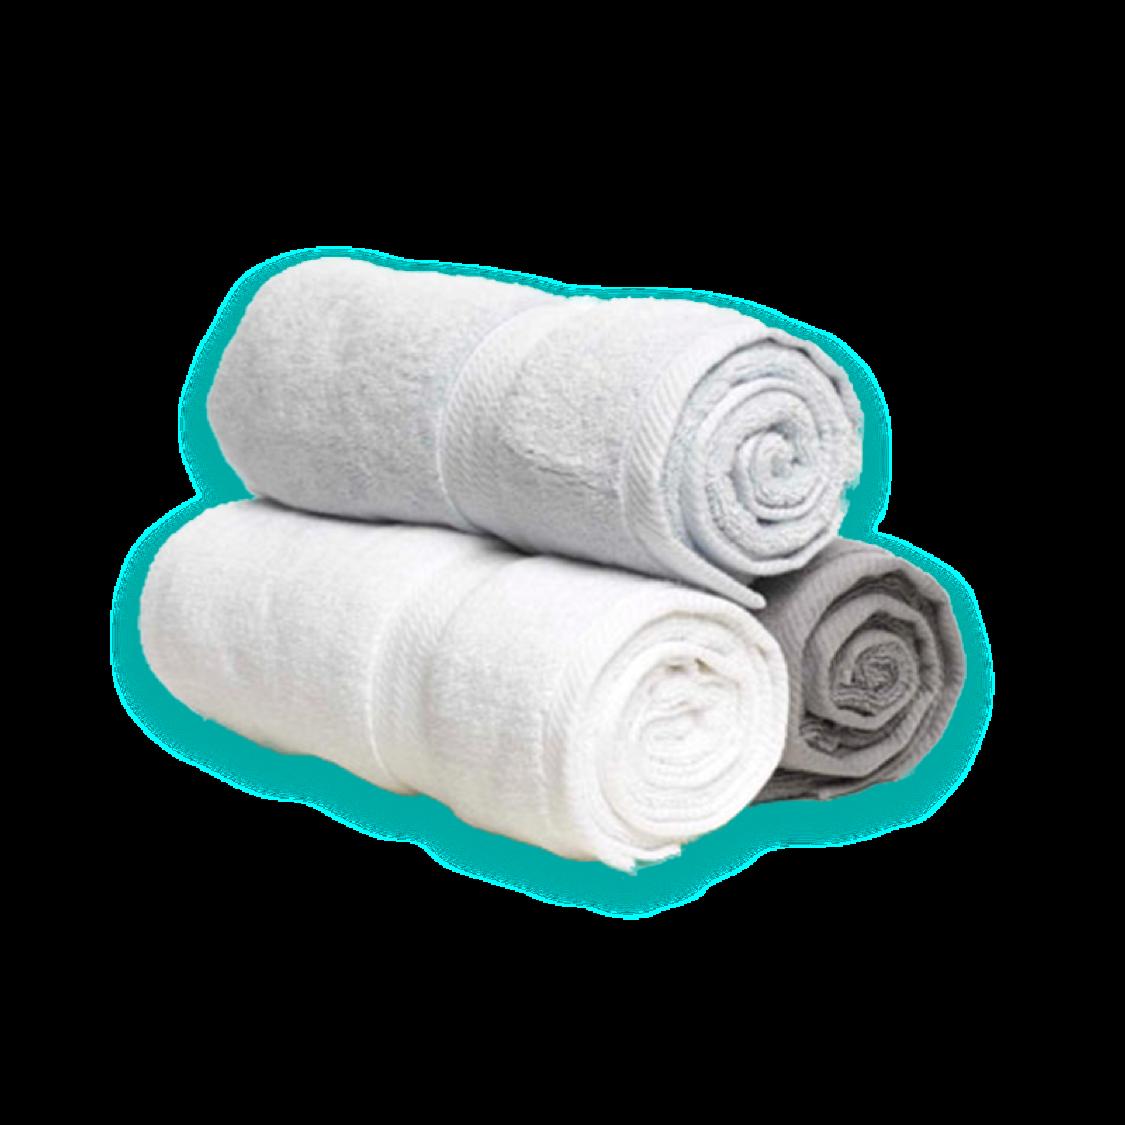 20201021 No Gym Bag Necessary - Towels.png